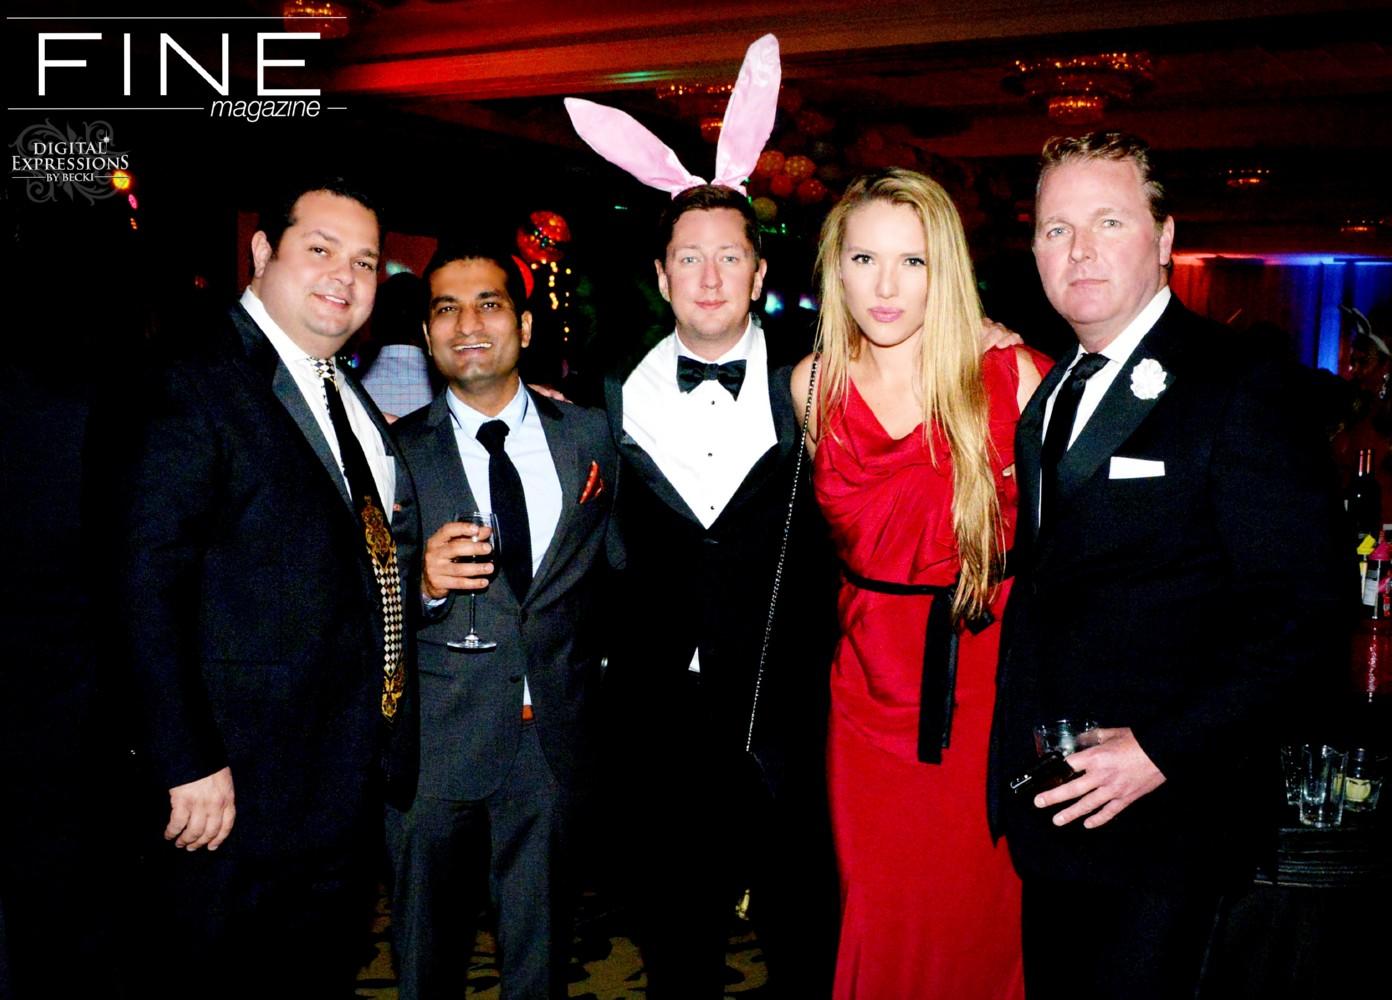 2016 Bunny Ball by FINE Magazine - 1.jpg